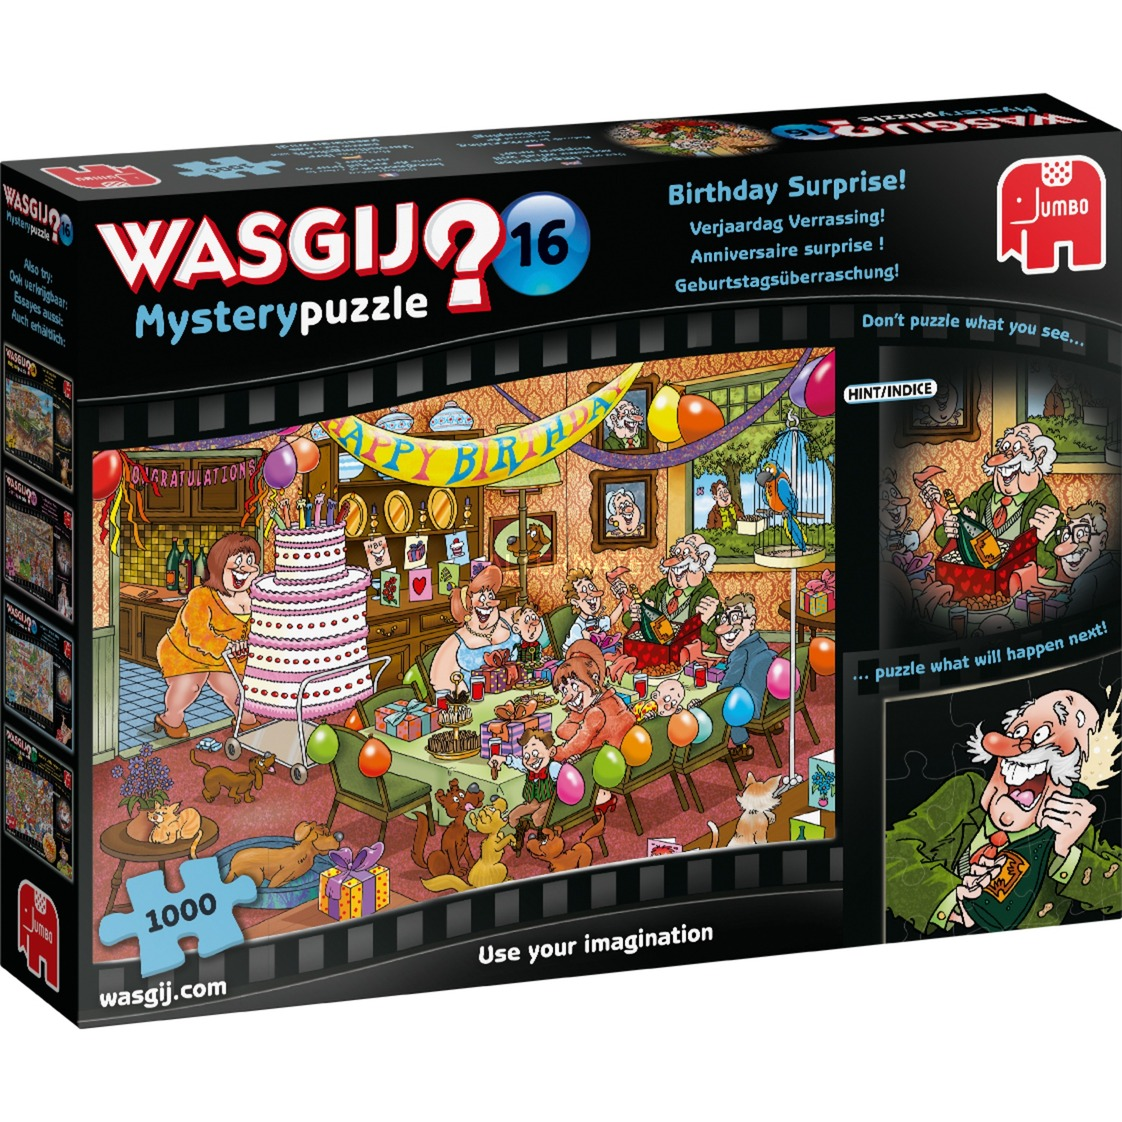 Jumbo Wasgij Mystery 16 Verjaardag Verrassing Puzzel 1000 Stukjes